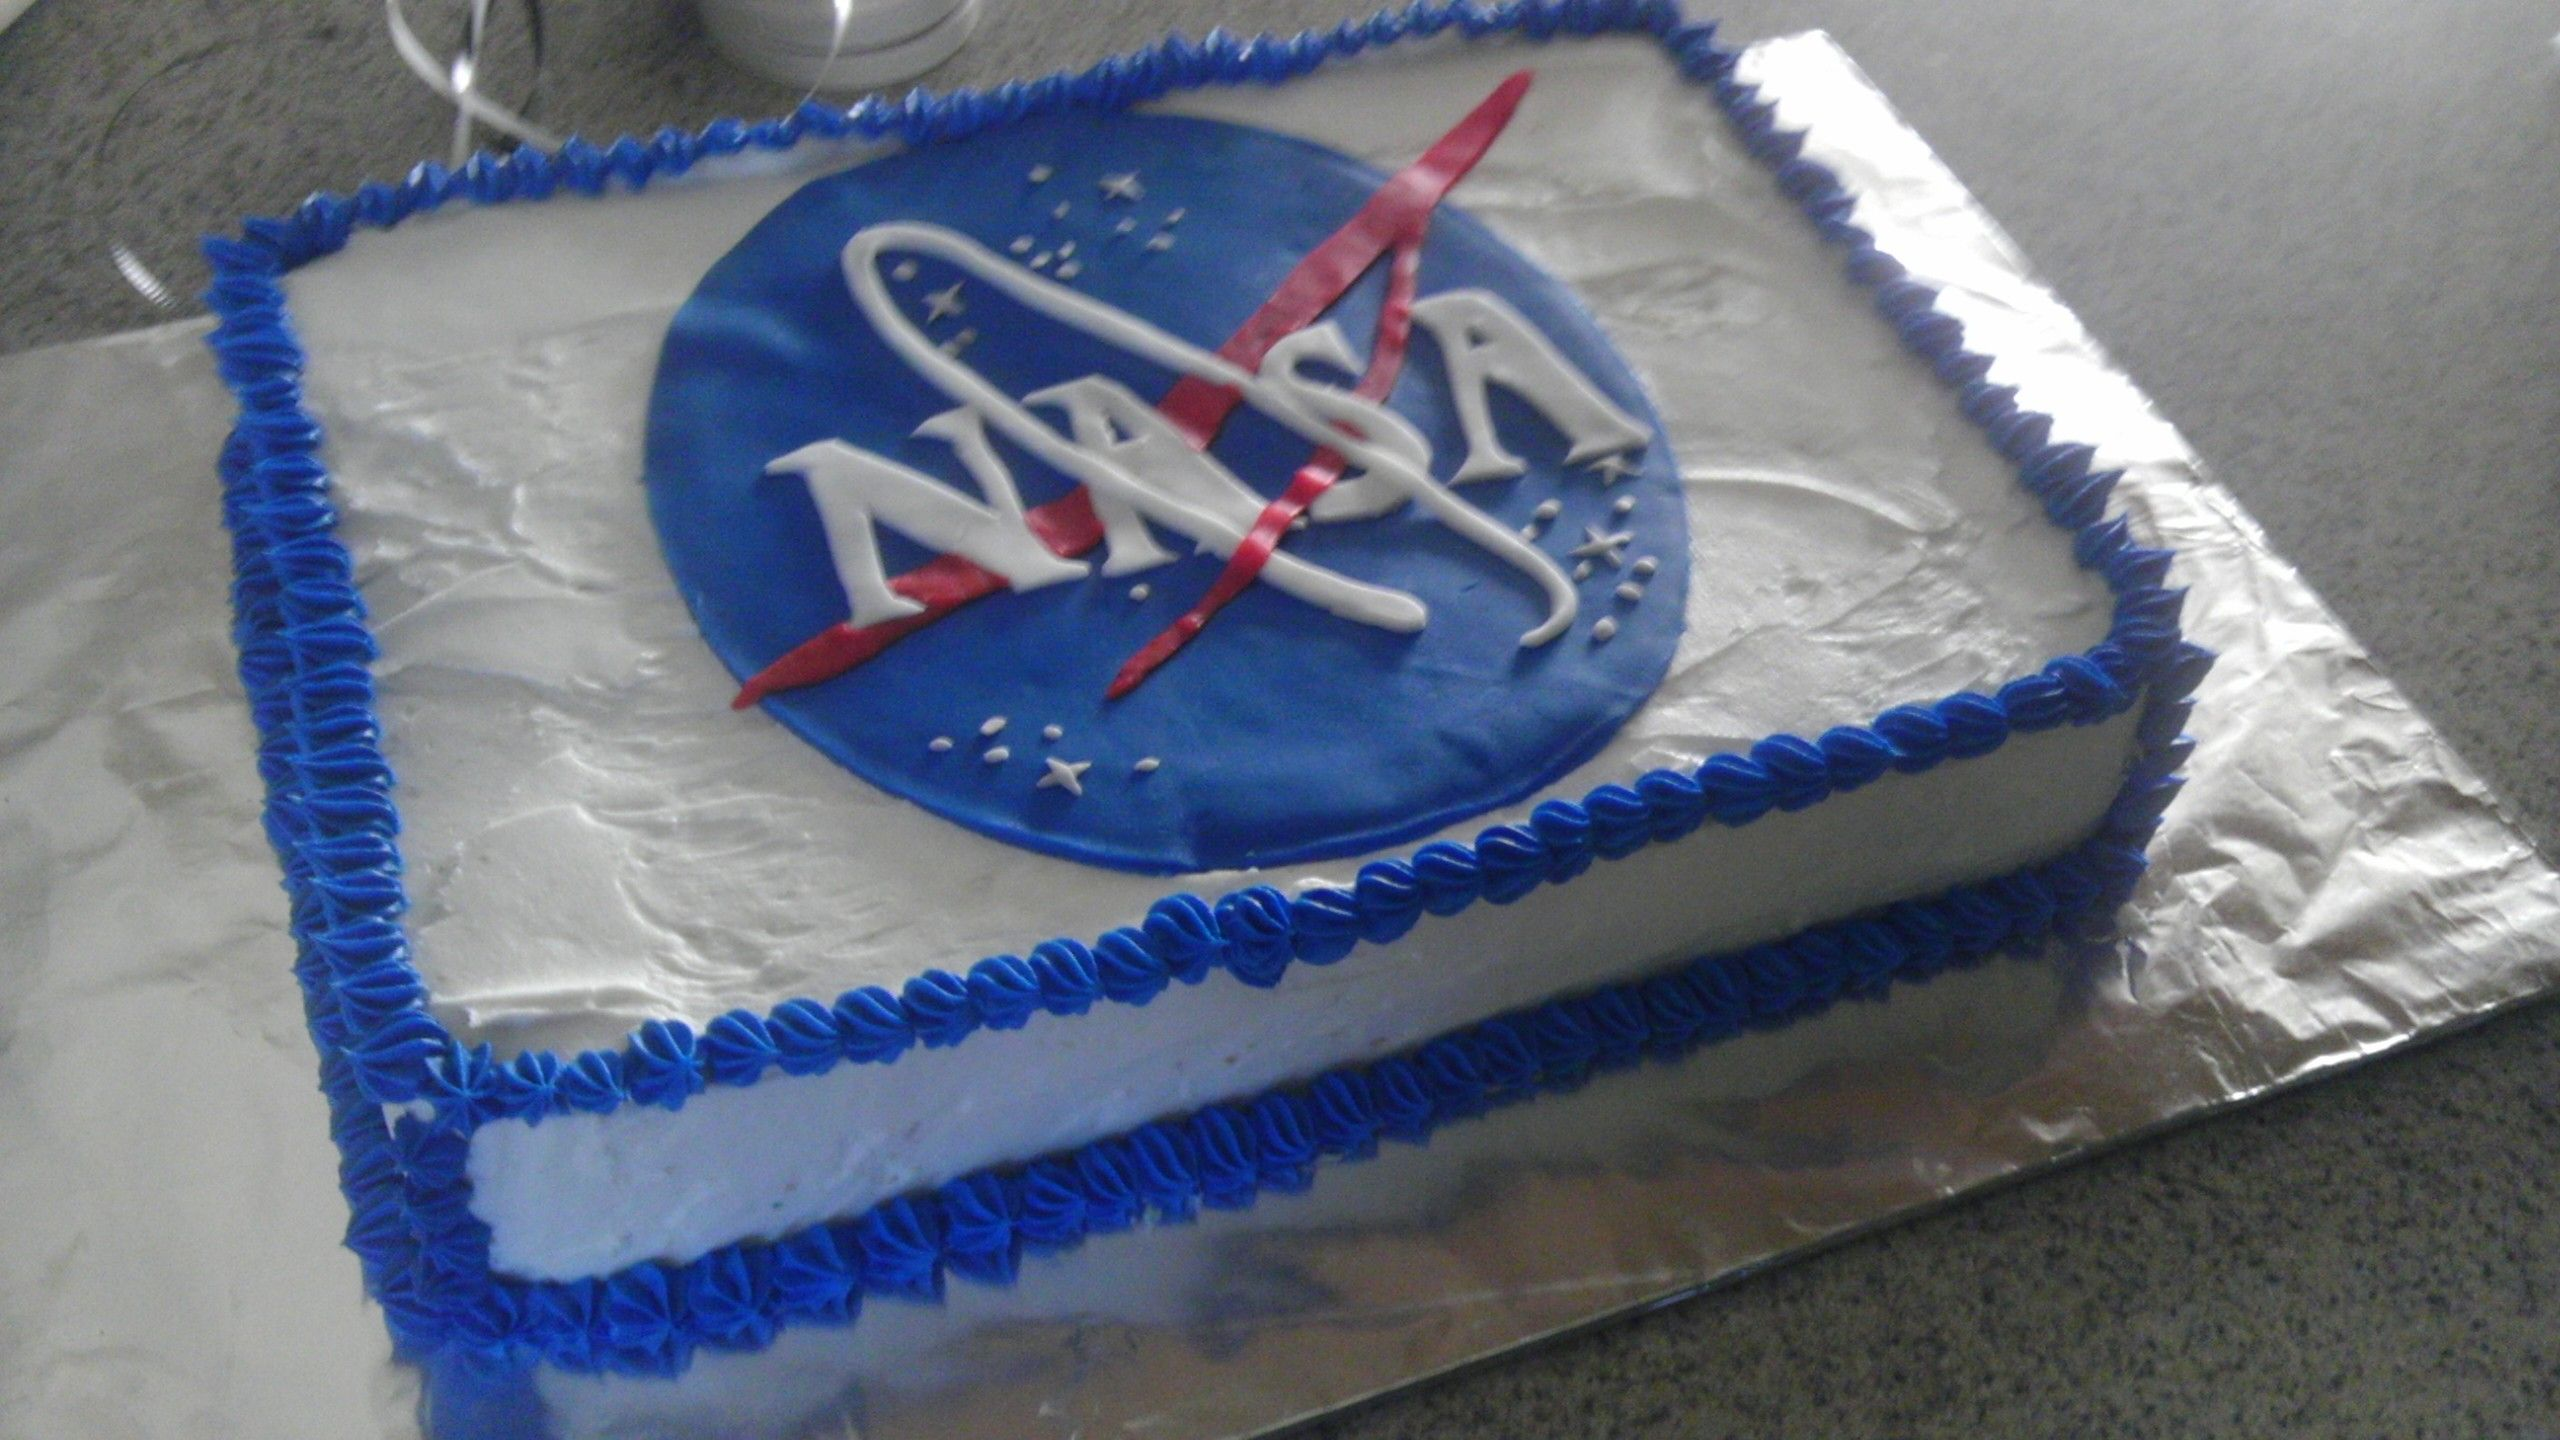 NASA Cake Craig's first in 2019 9th birthday cake